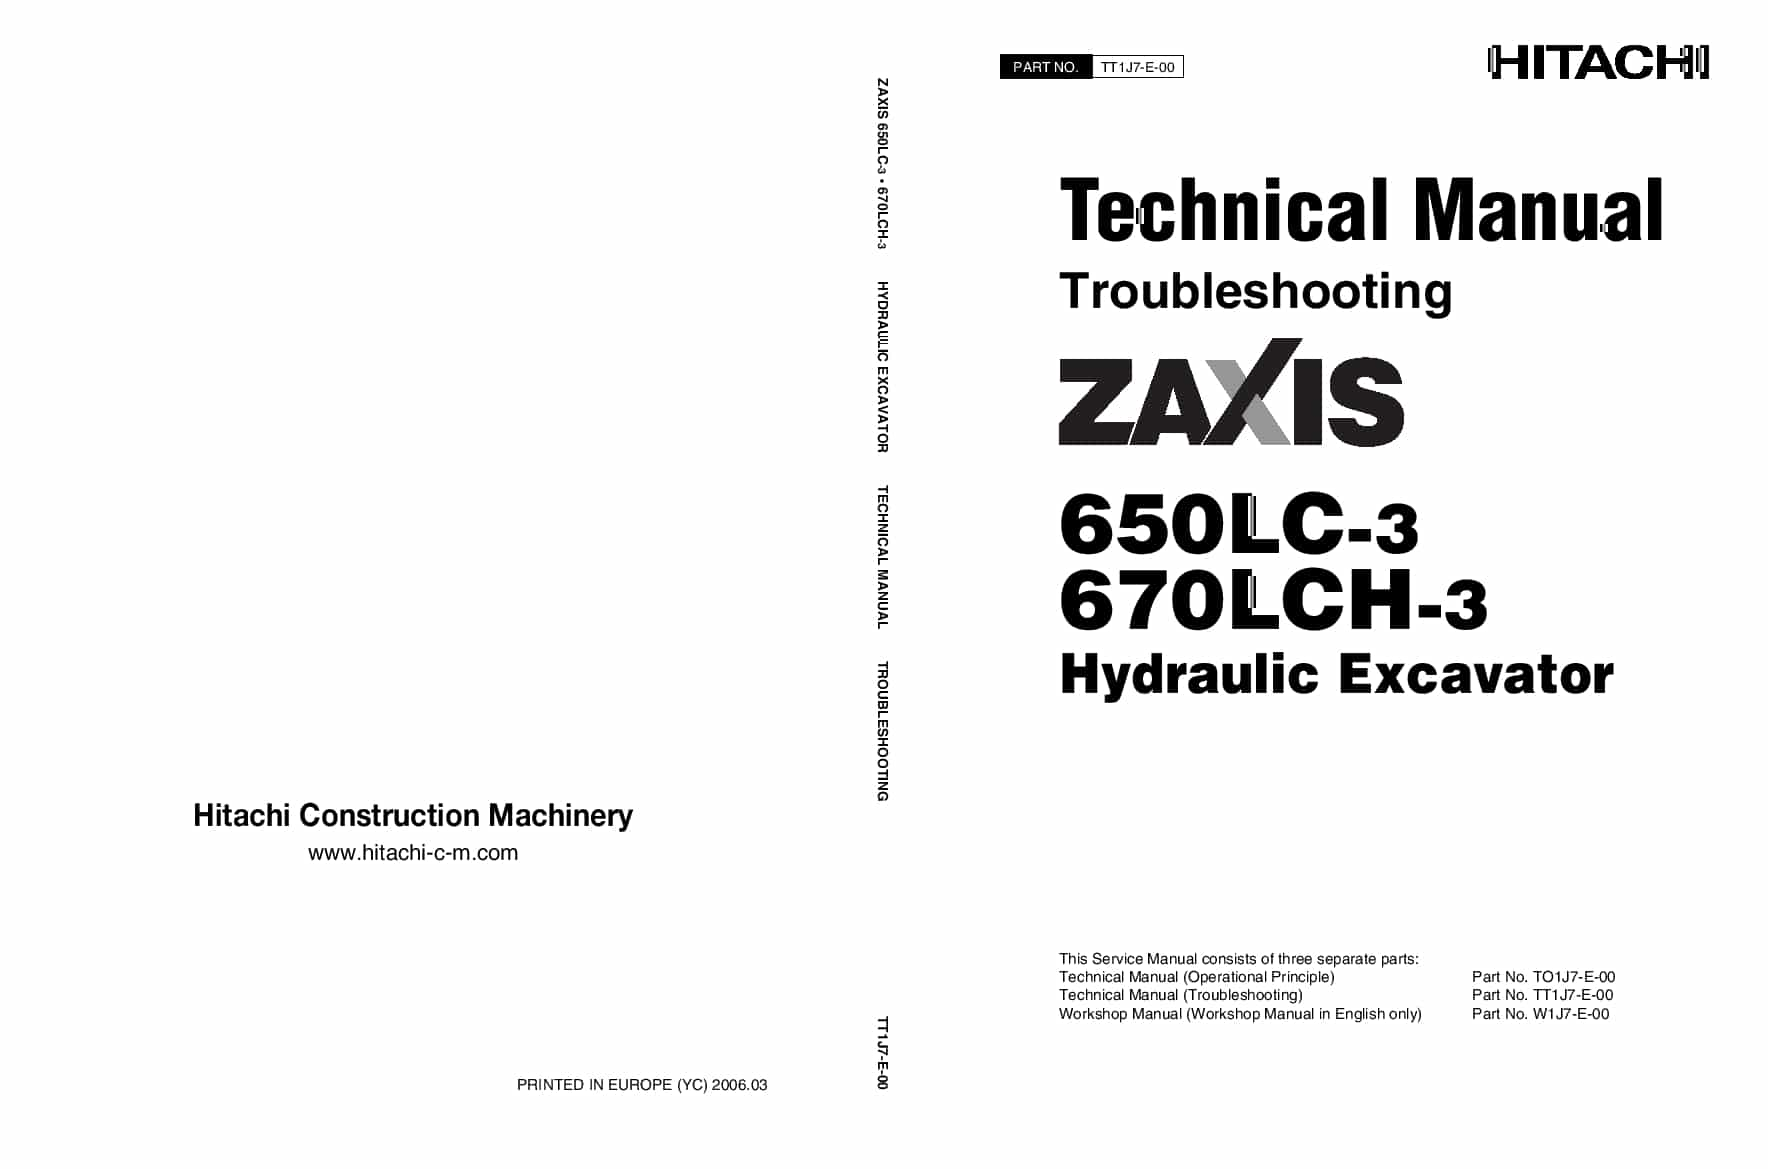 Hitachi ZX670-3 650-3 Excavator Troubleshooting Technical